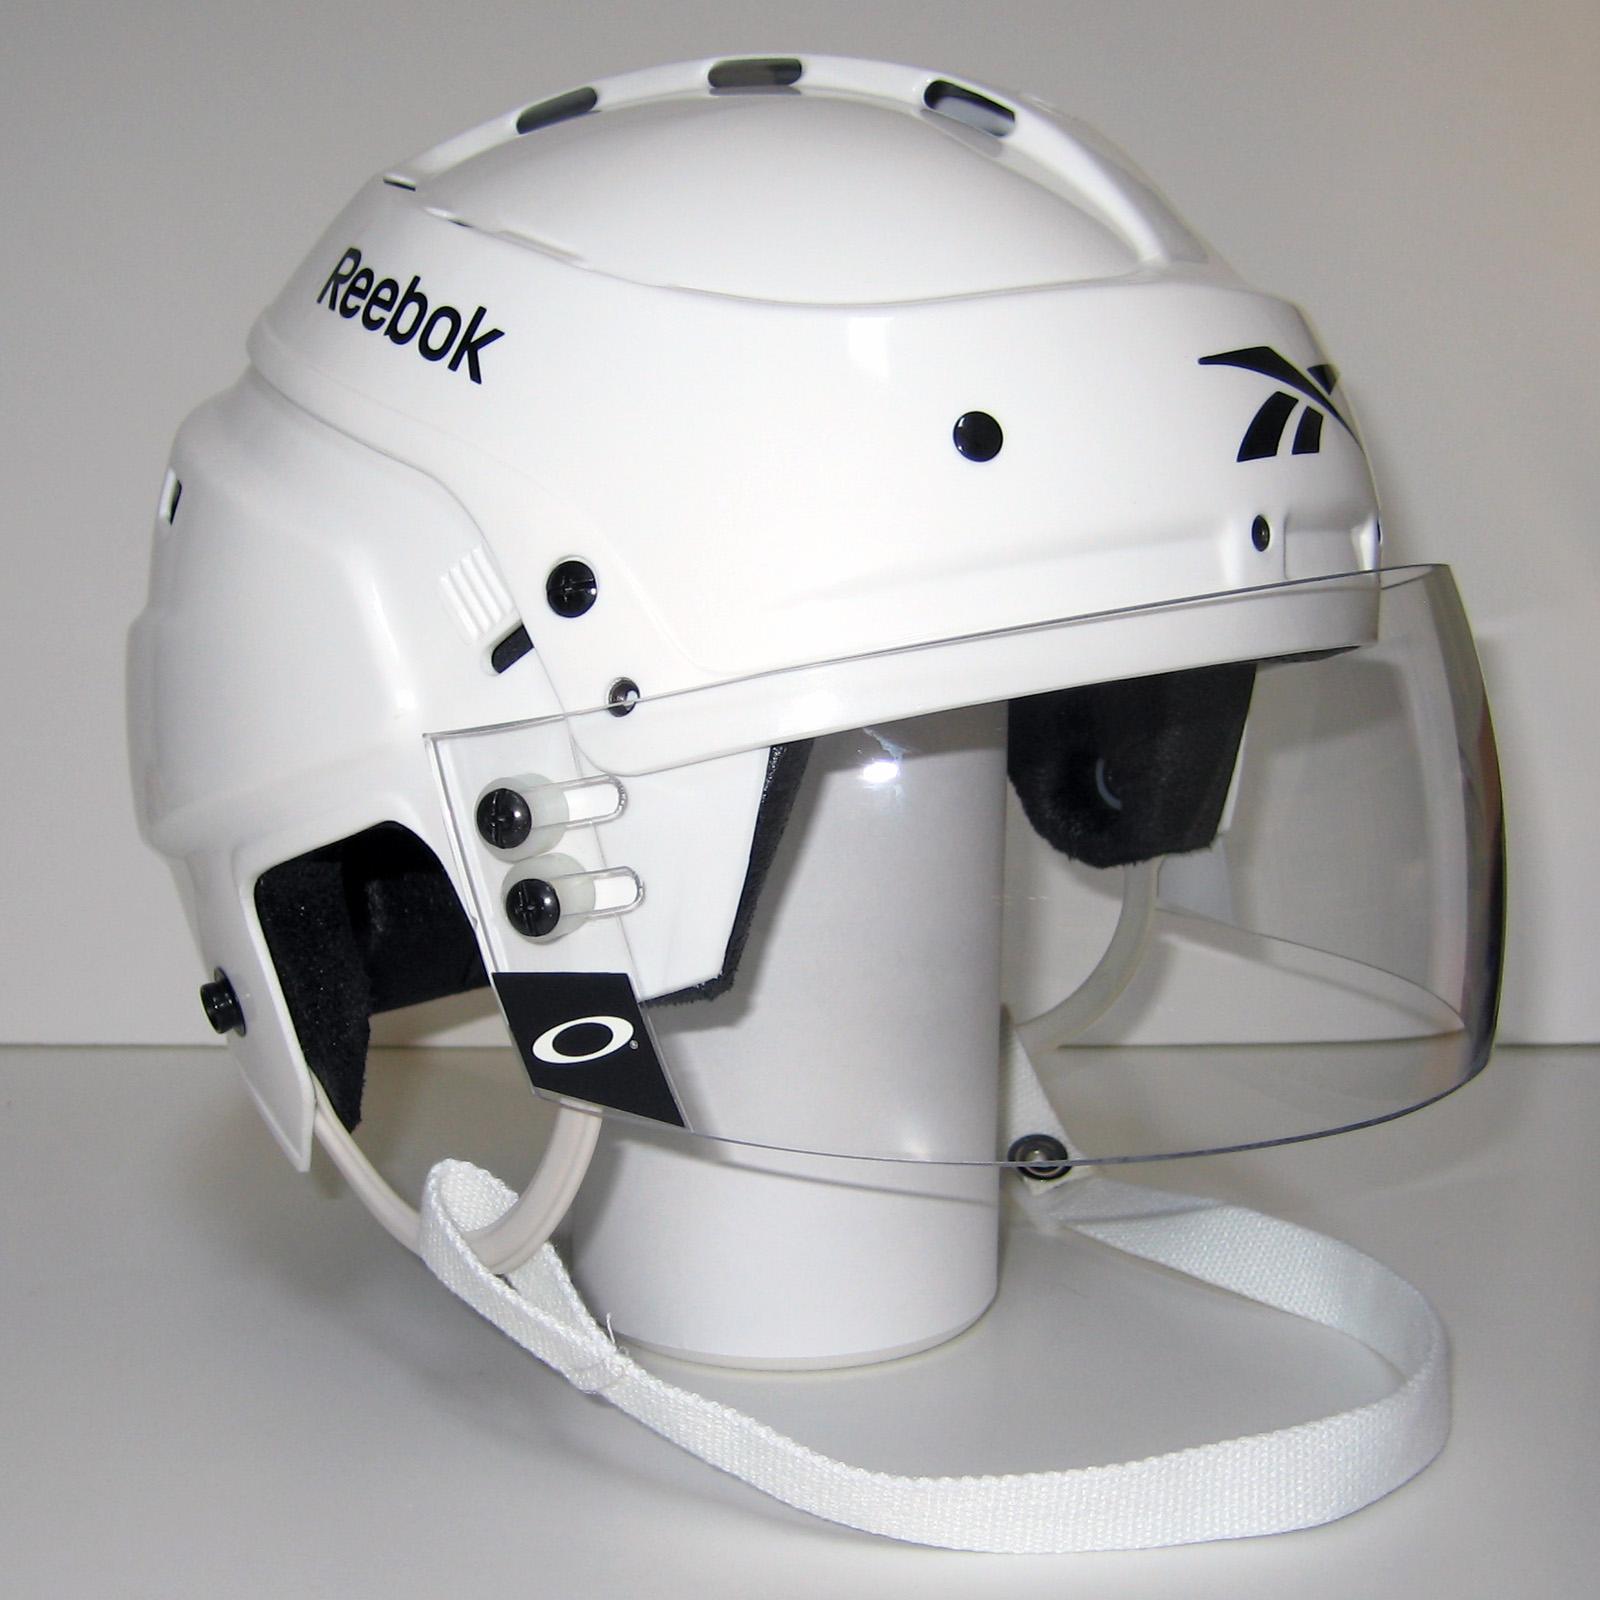 Reebok hockey helmets